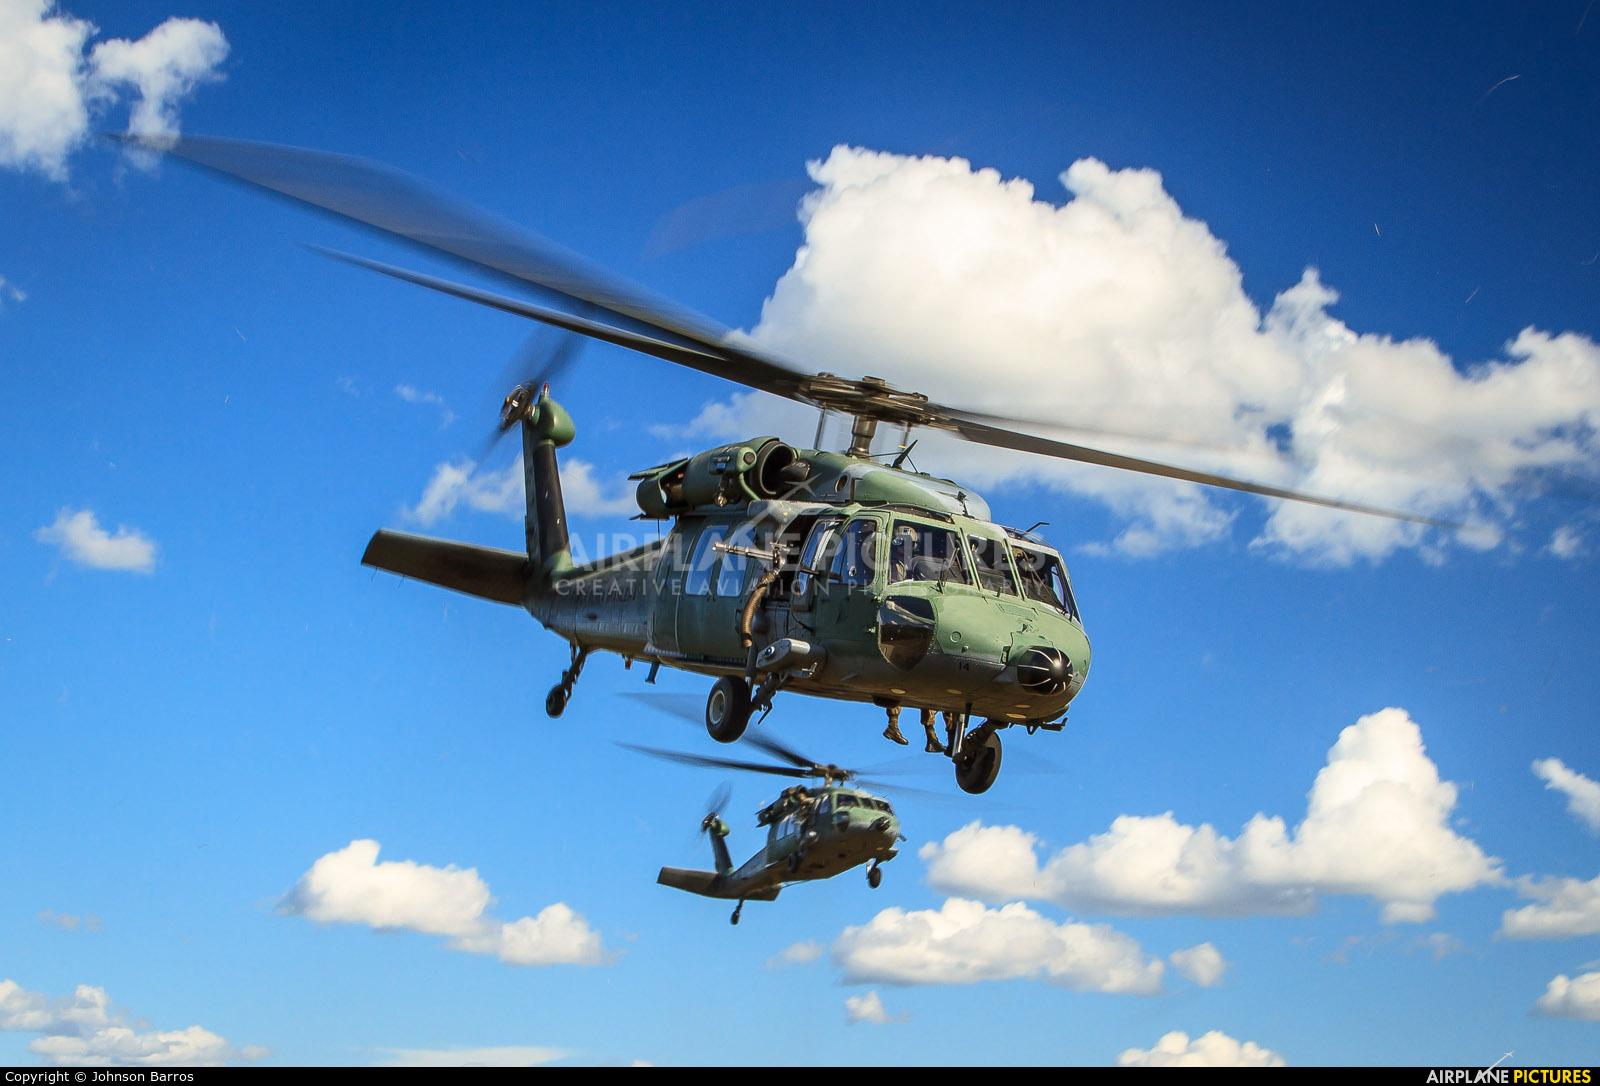 Brazil - Air Force 8914 aircraft at Off Airport - Brazil